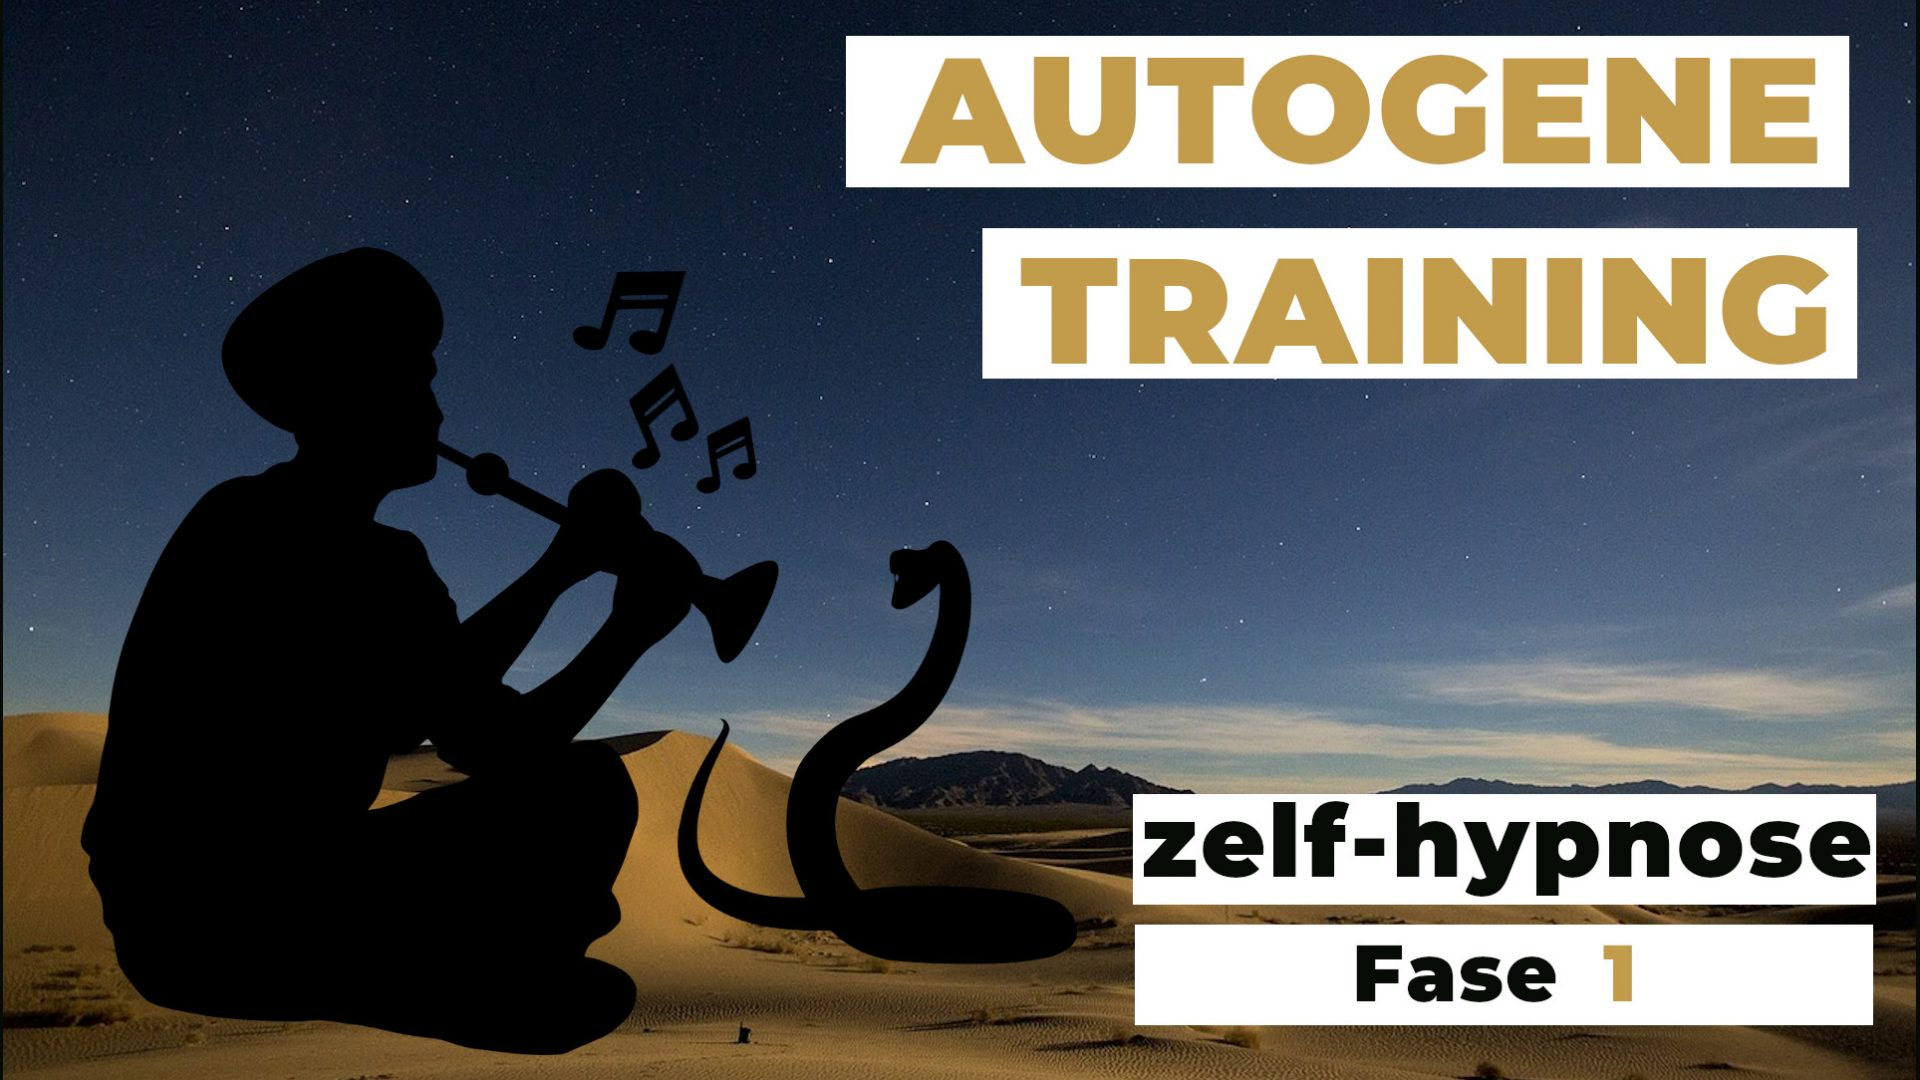 thumbnail_relaxatie_autonome training_alt2 fase1